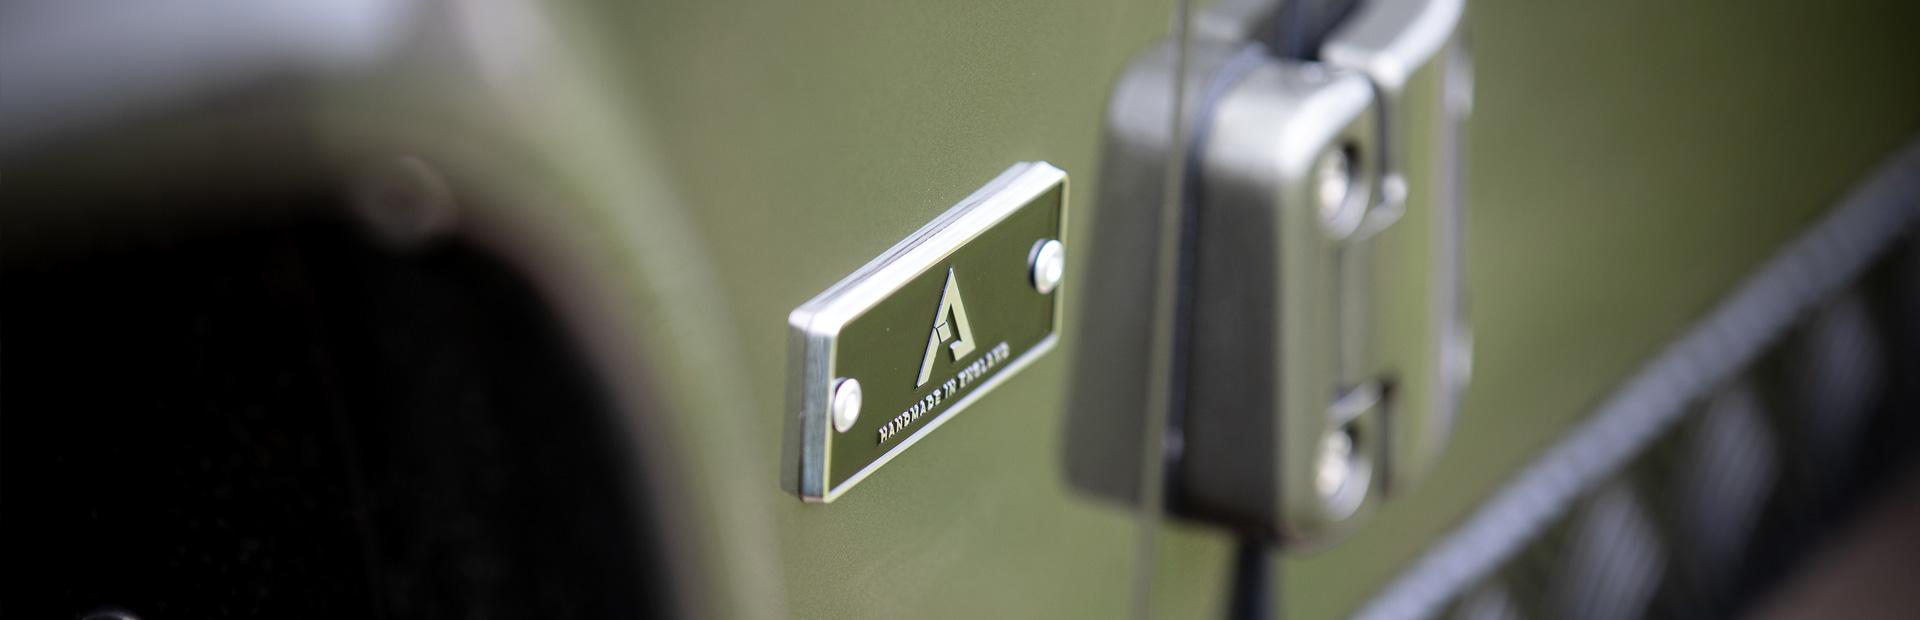 Arkonik Colt - Custom built Land Rover Defender 110